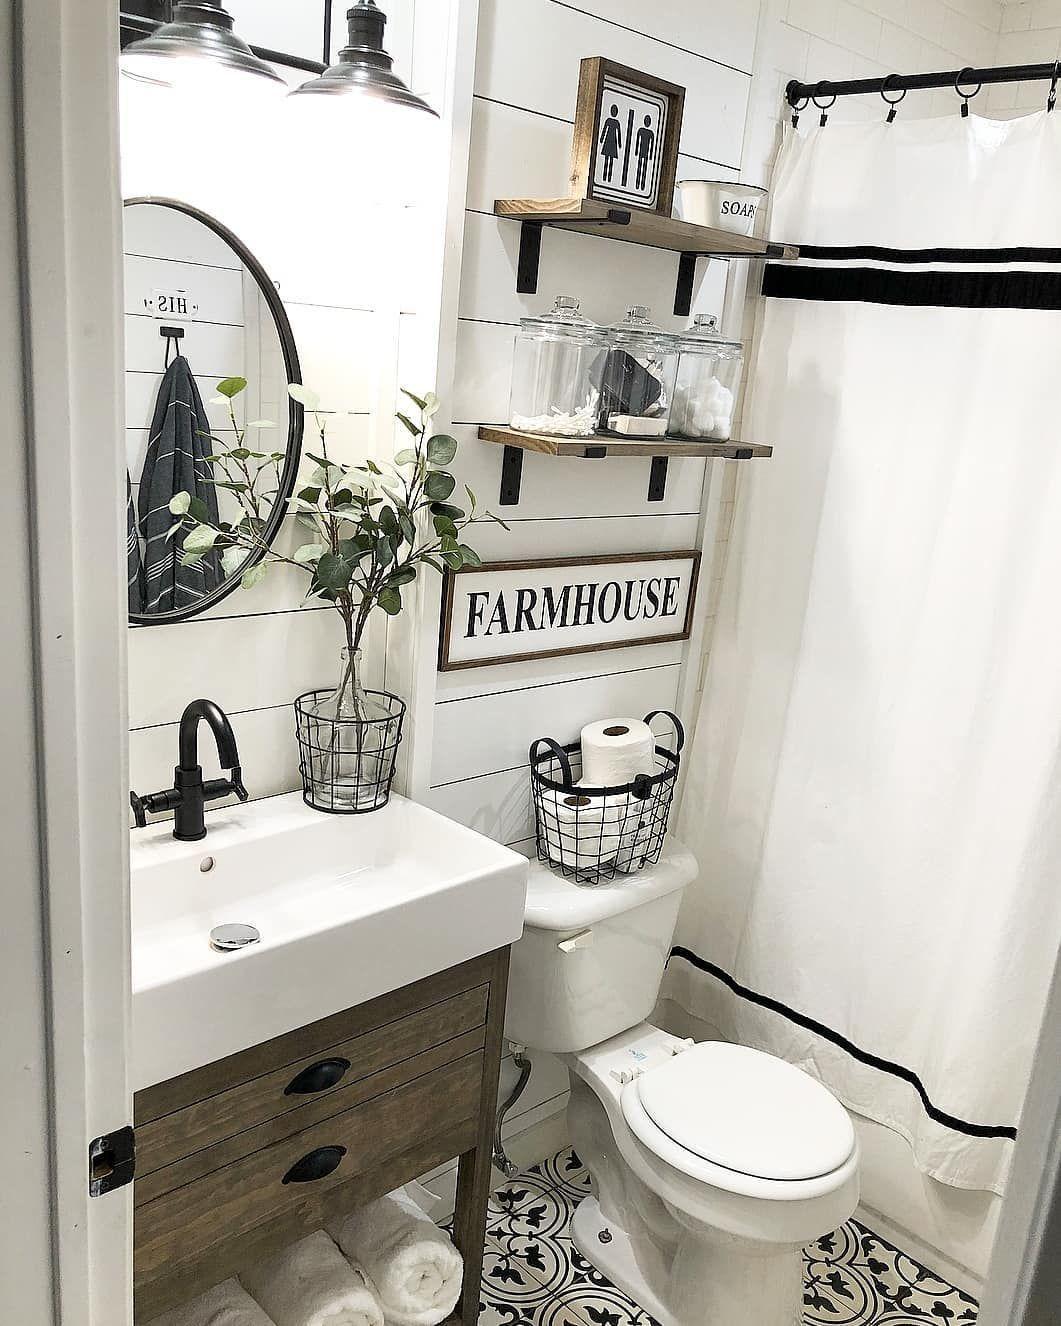 Farmhouse Goals On Instagram This Farmhouse Bathroom Is Goals What Do You Think Farmhouse Bathroom Decor Modern Farmhouse Bathroom Bathroom Makeover